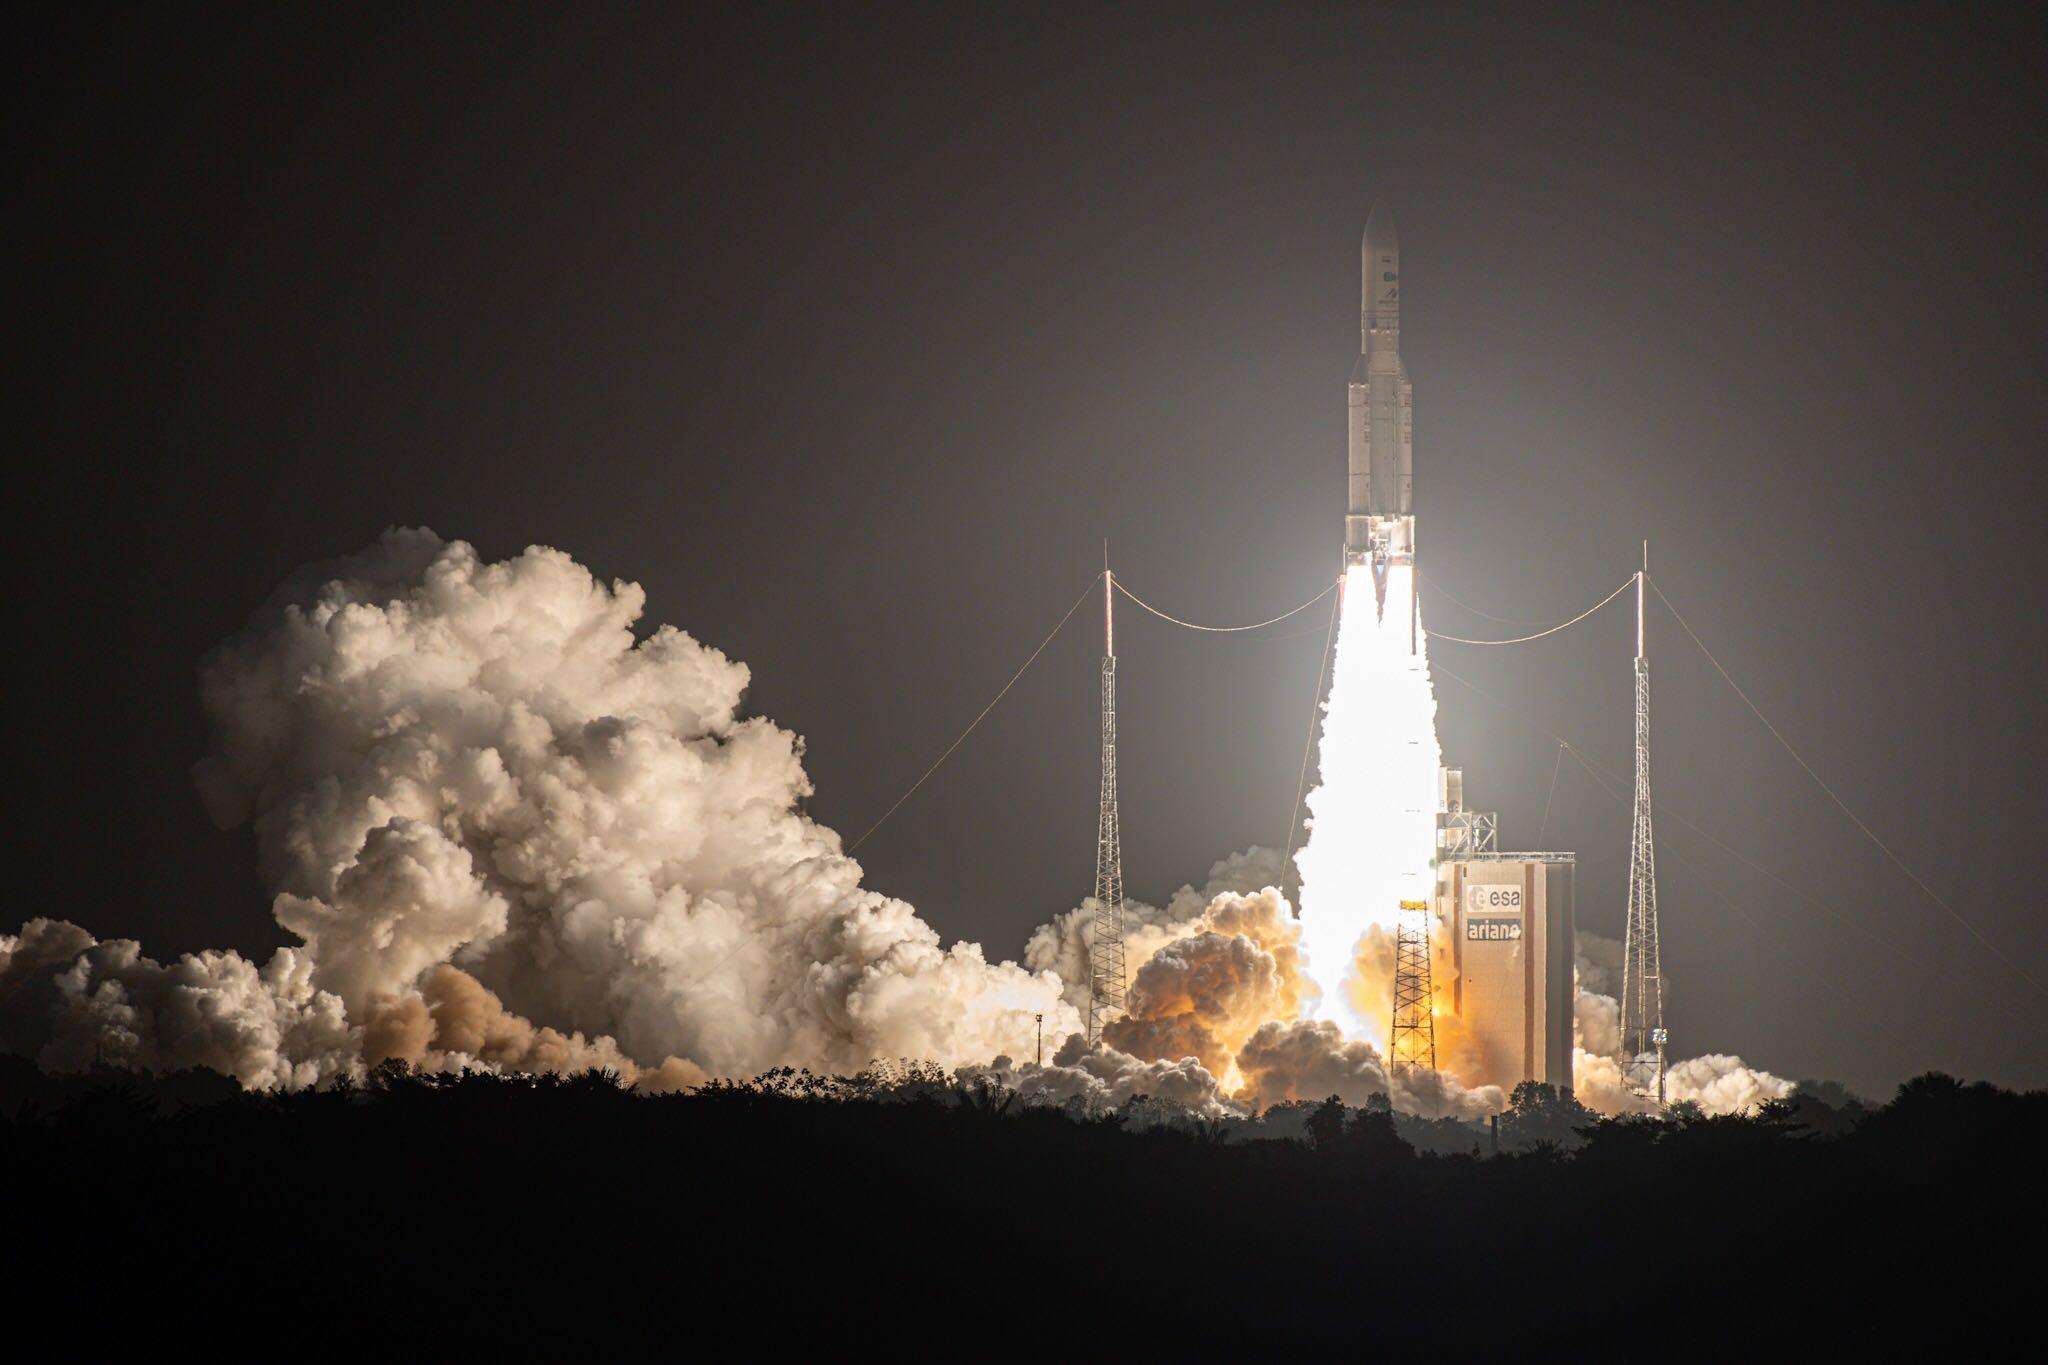 http://www.esa.int/var/esa/storage/images/esa_multimedia/images/2019/11/ariane_5_liftoff3/21479988-4-eng-GB/Ariane_5_liftoff.jpg